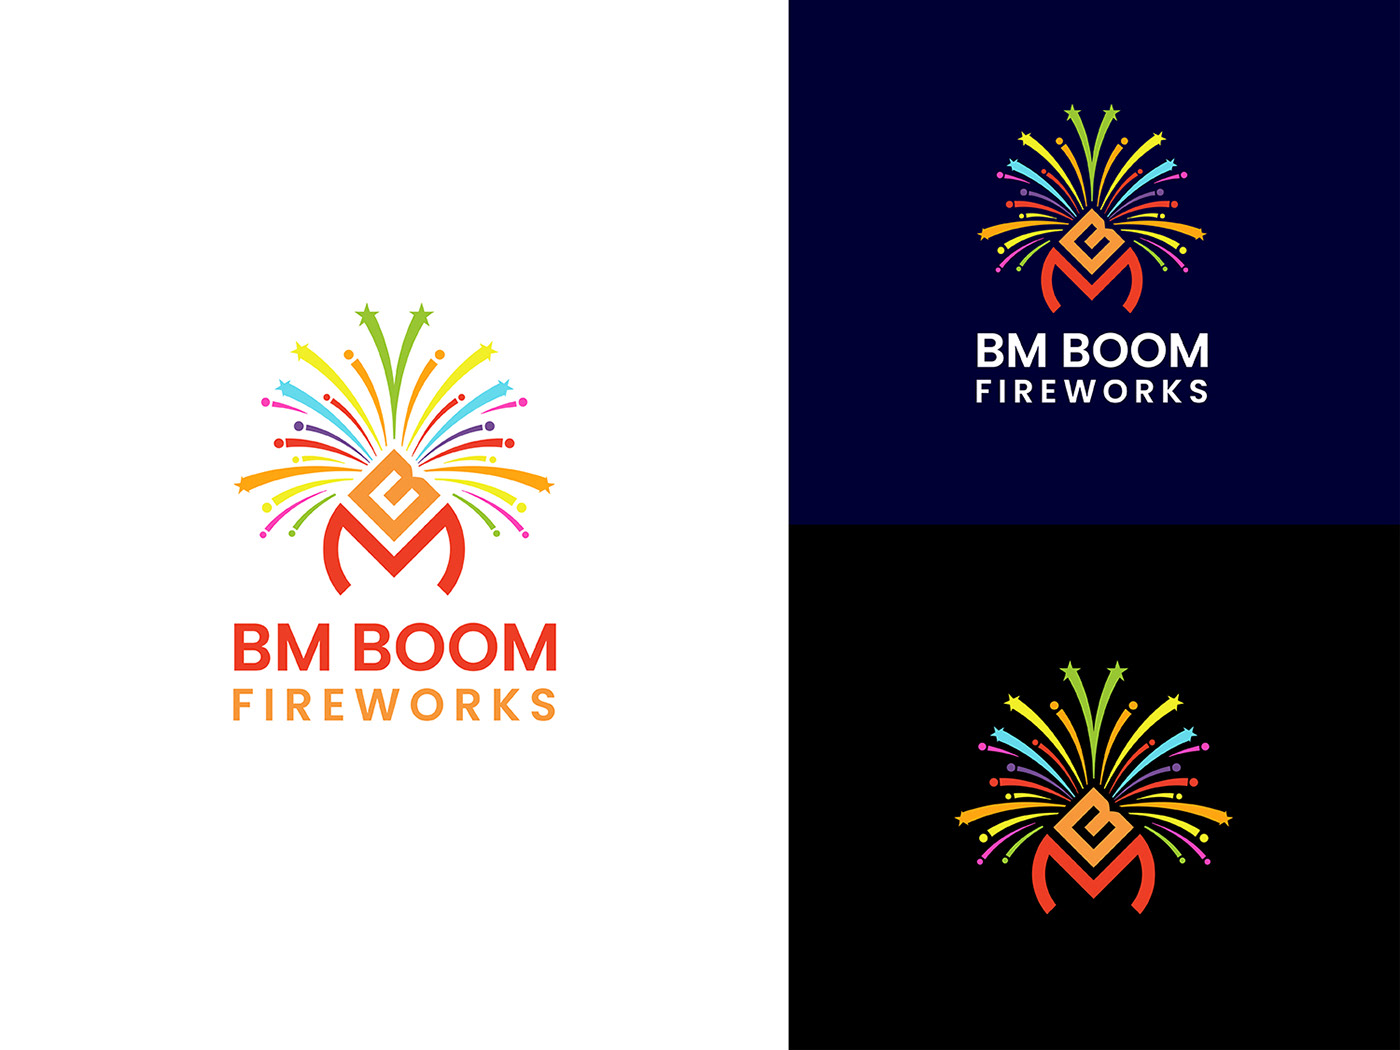 adobe illustrator aminul360 brand identity graphic design  identity logo Logo Design logos Logotype typography